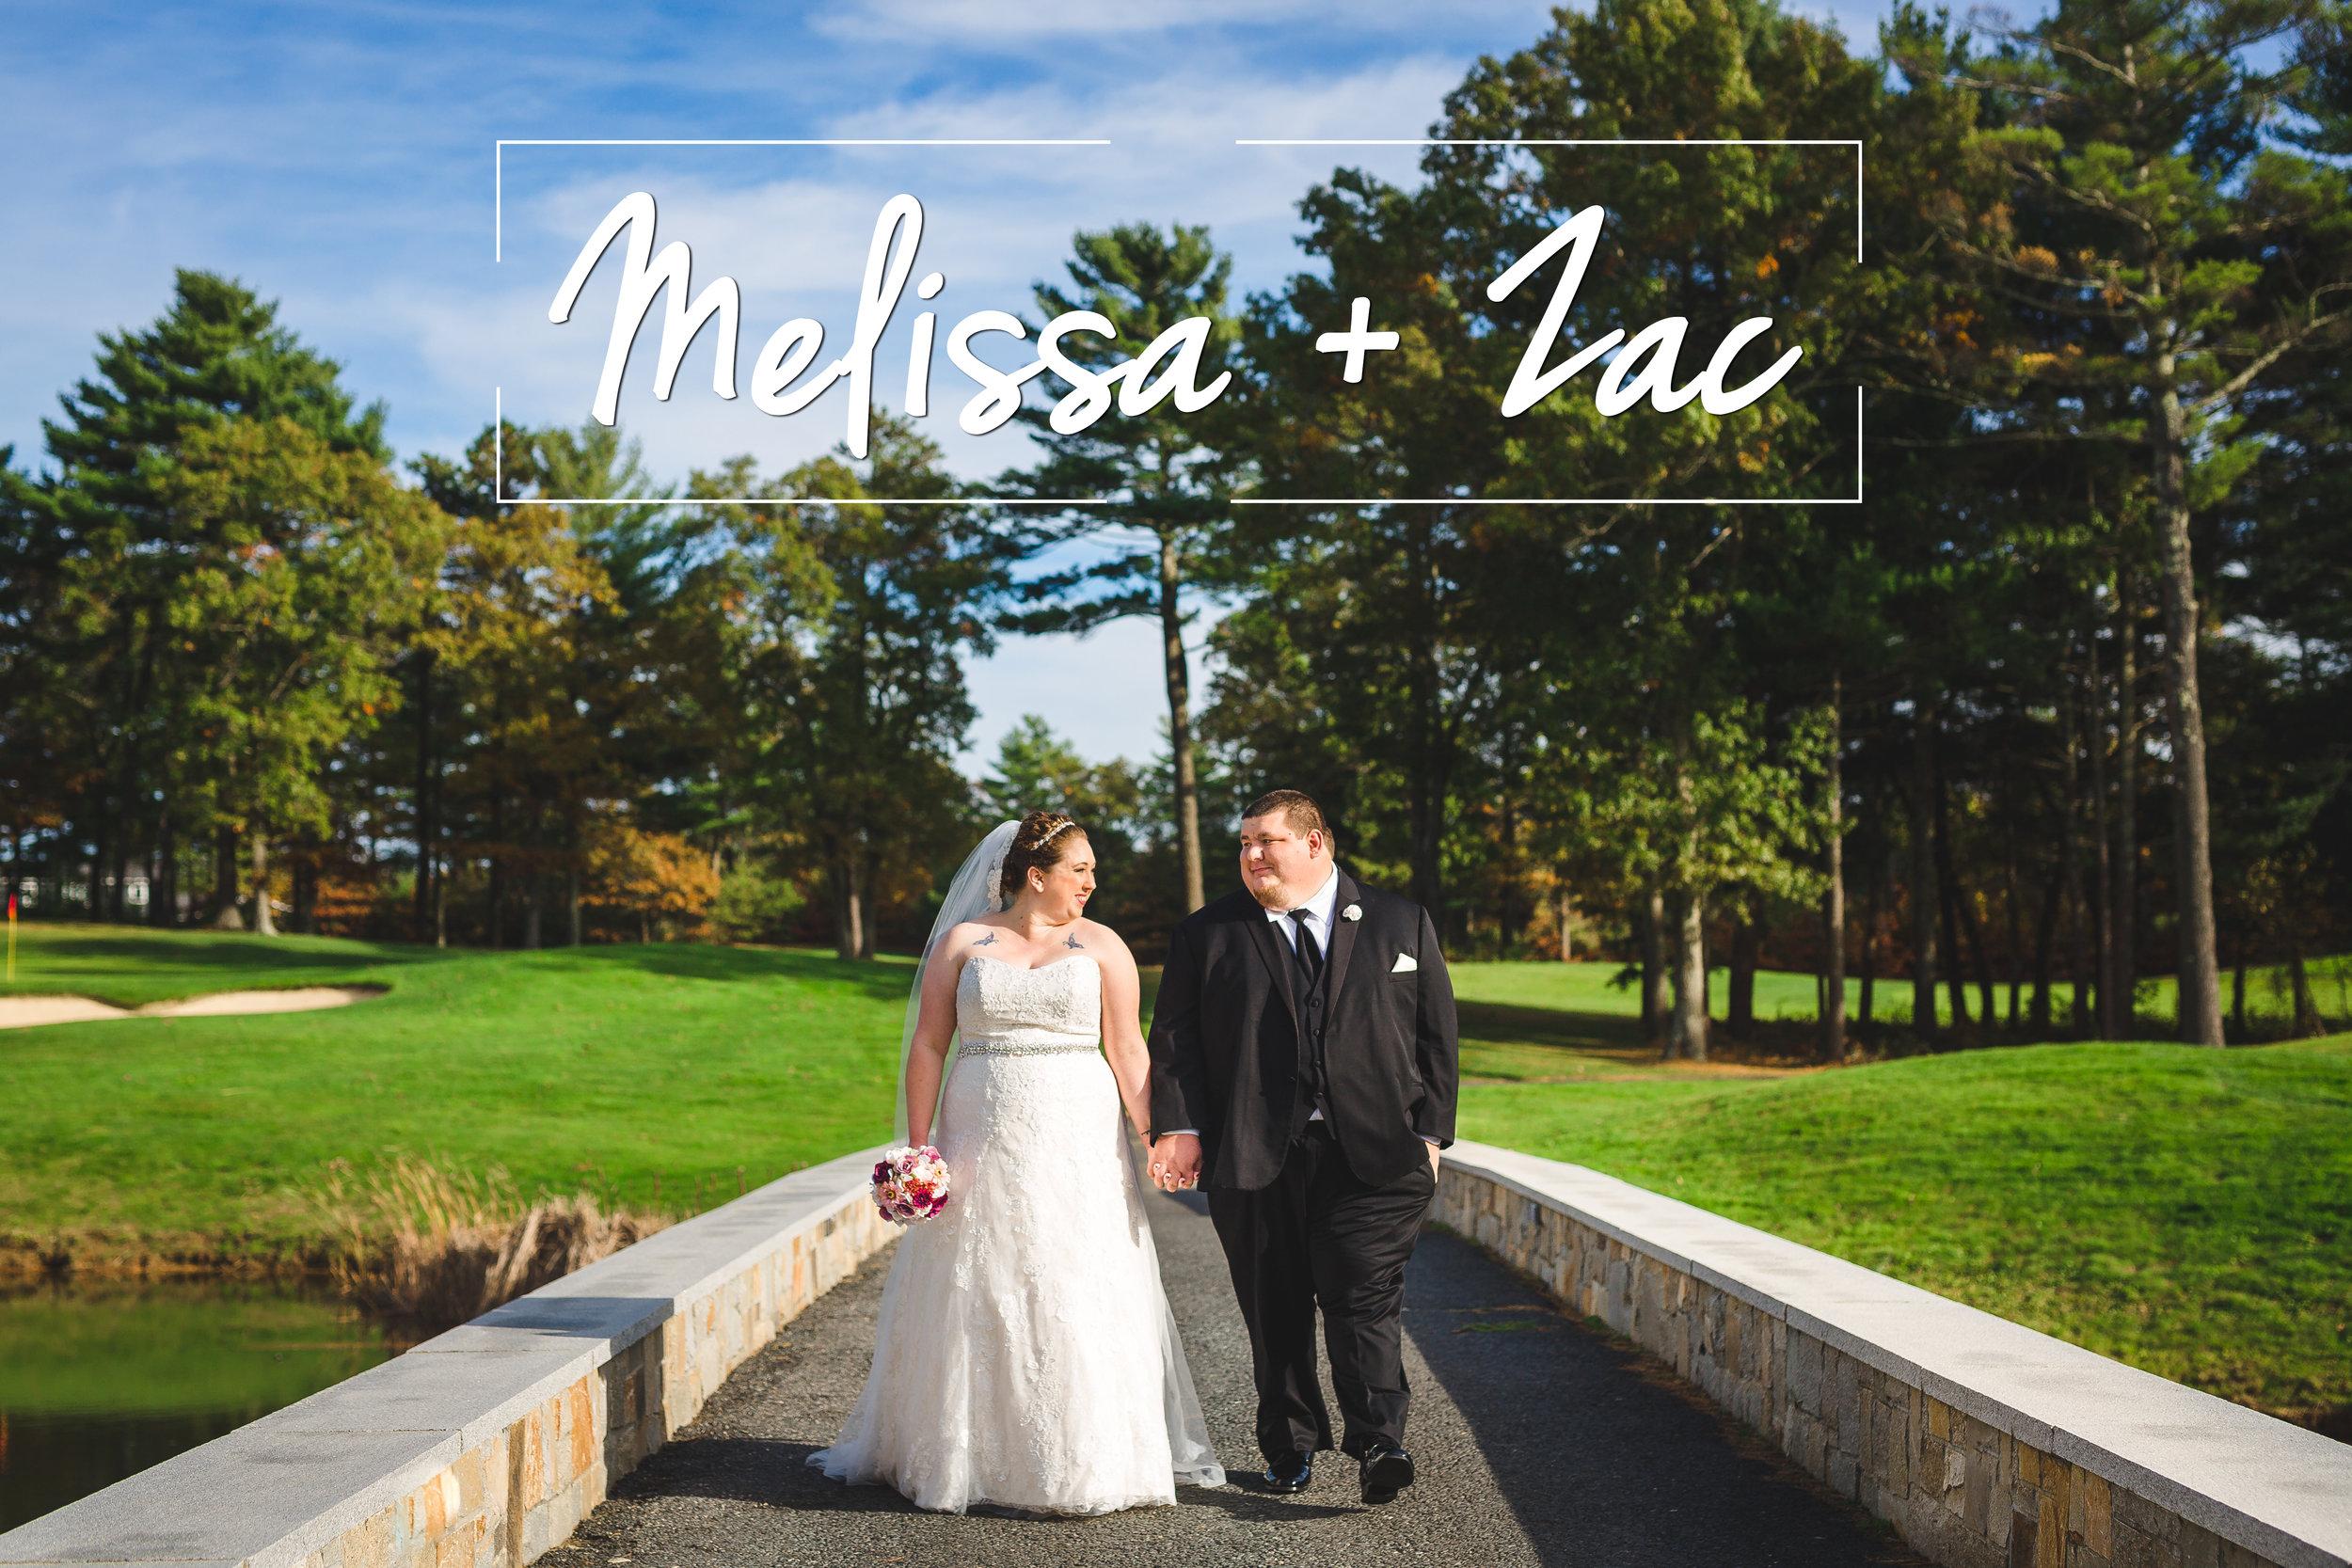 1047-Melissa&Zac_couplessession-9U6A0921.jpg